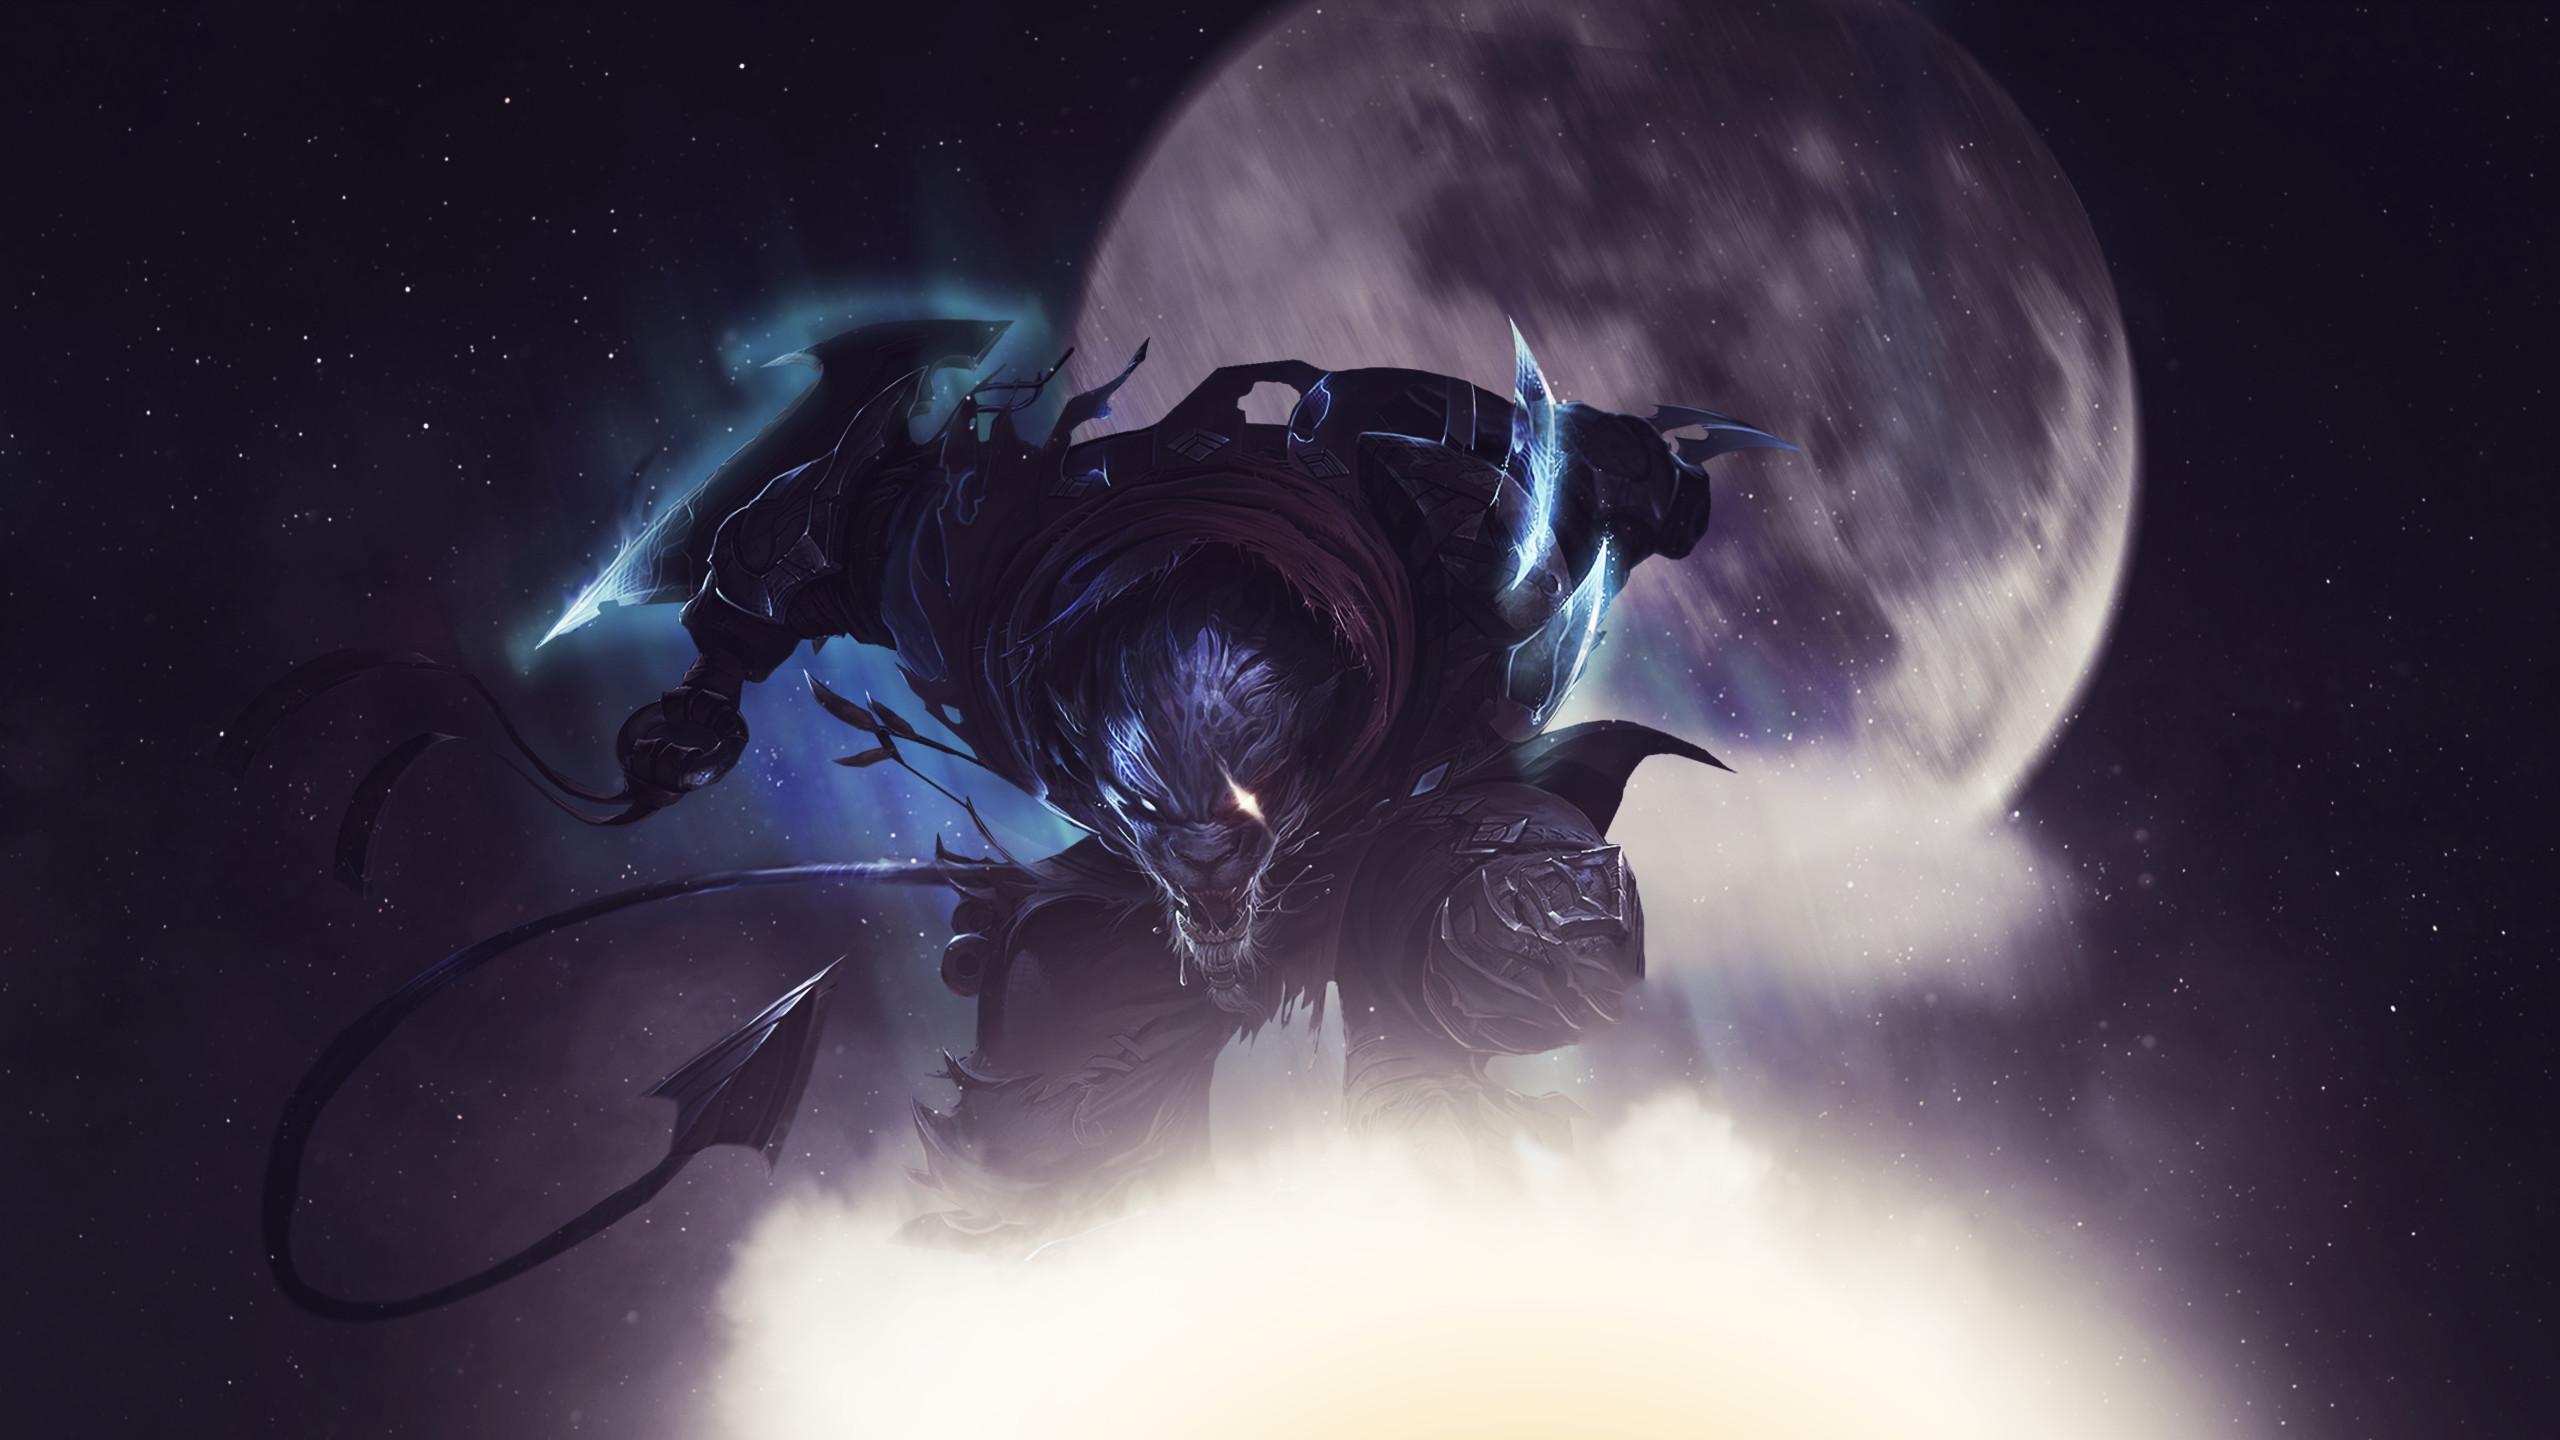 Image Link – Night Hunter Rengar Wallpaper